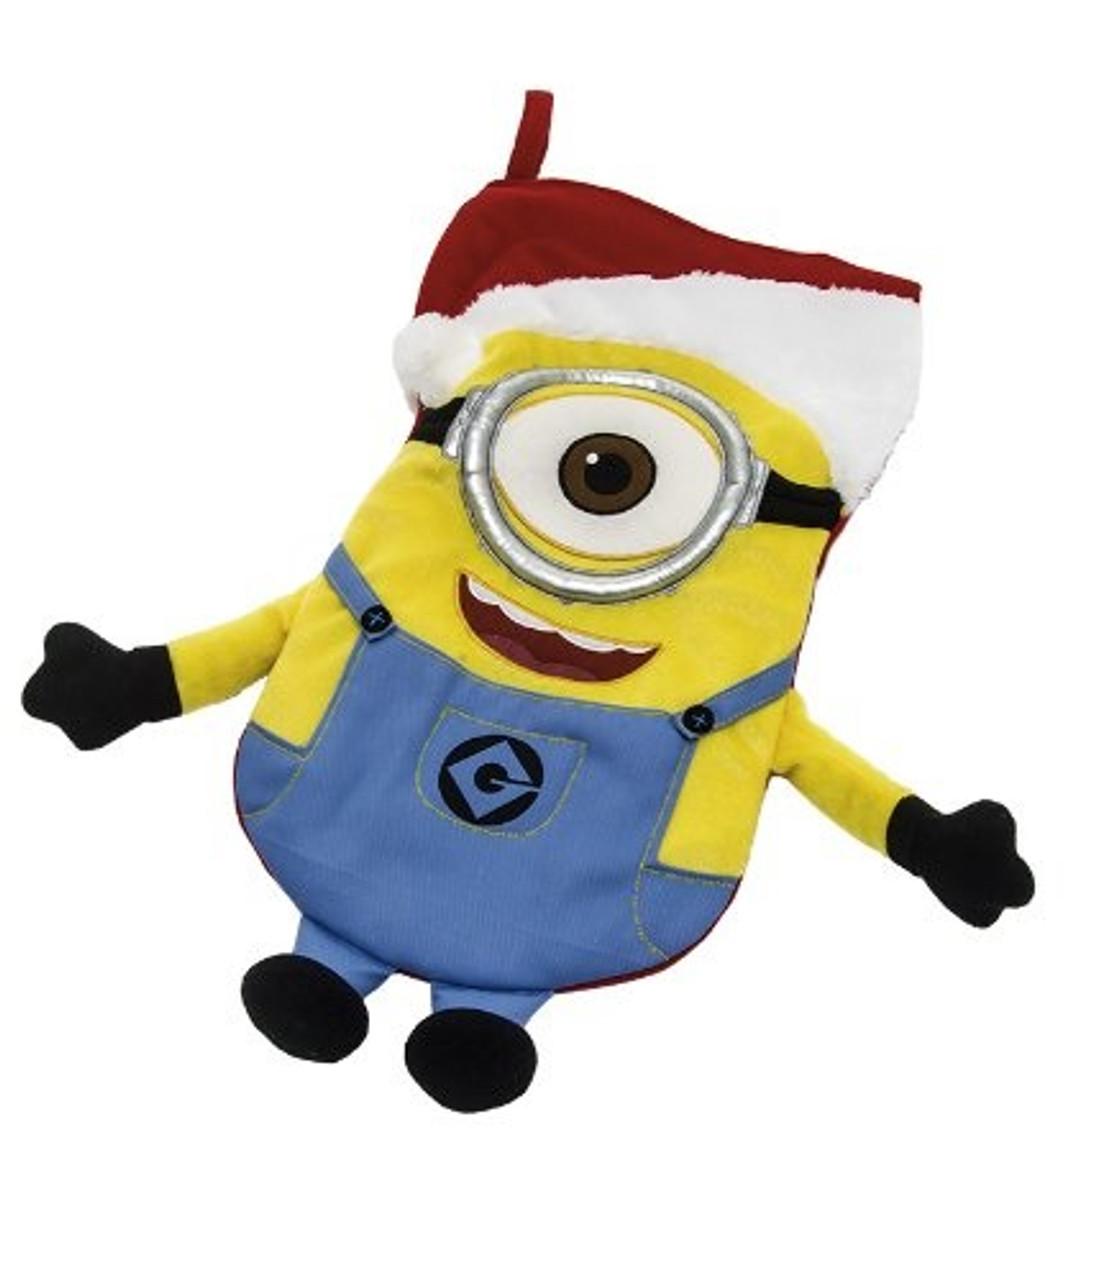 Minion Christmas.Despicable Me Minion Christmas Stocking